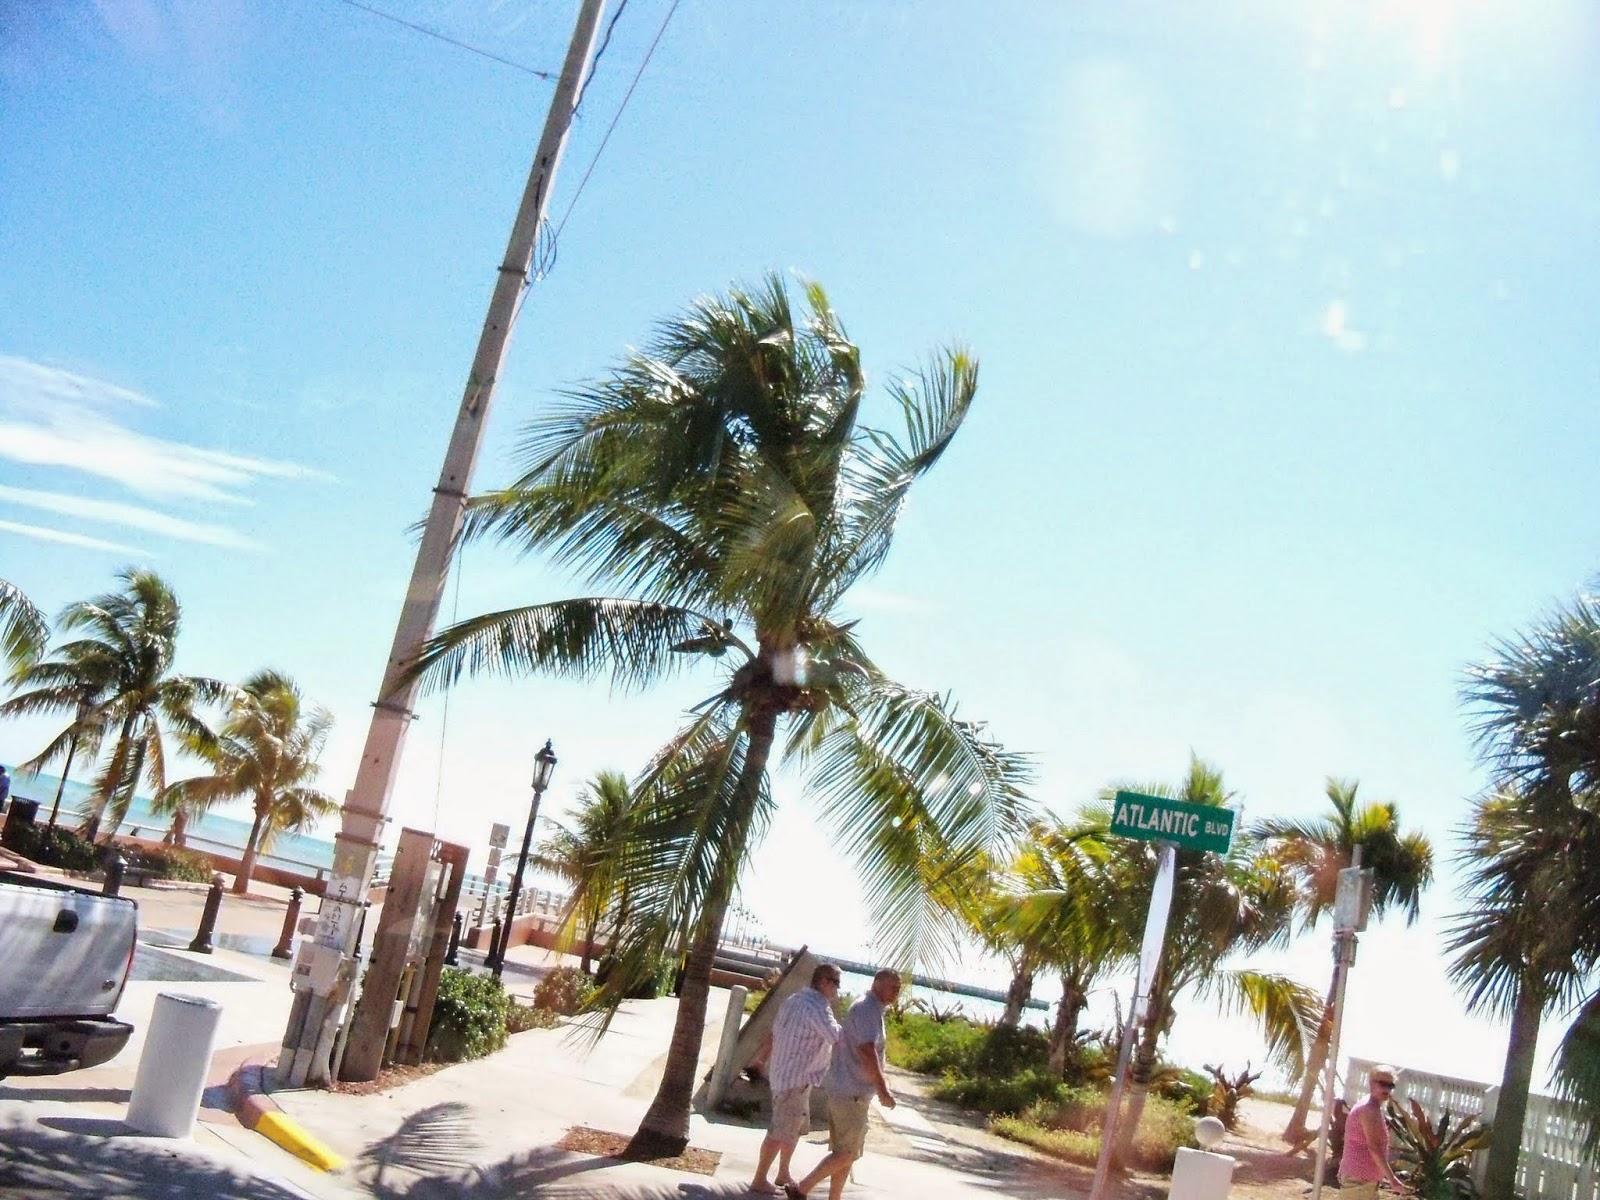 Key West Vacation - 116_5796.JPG